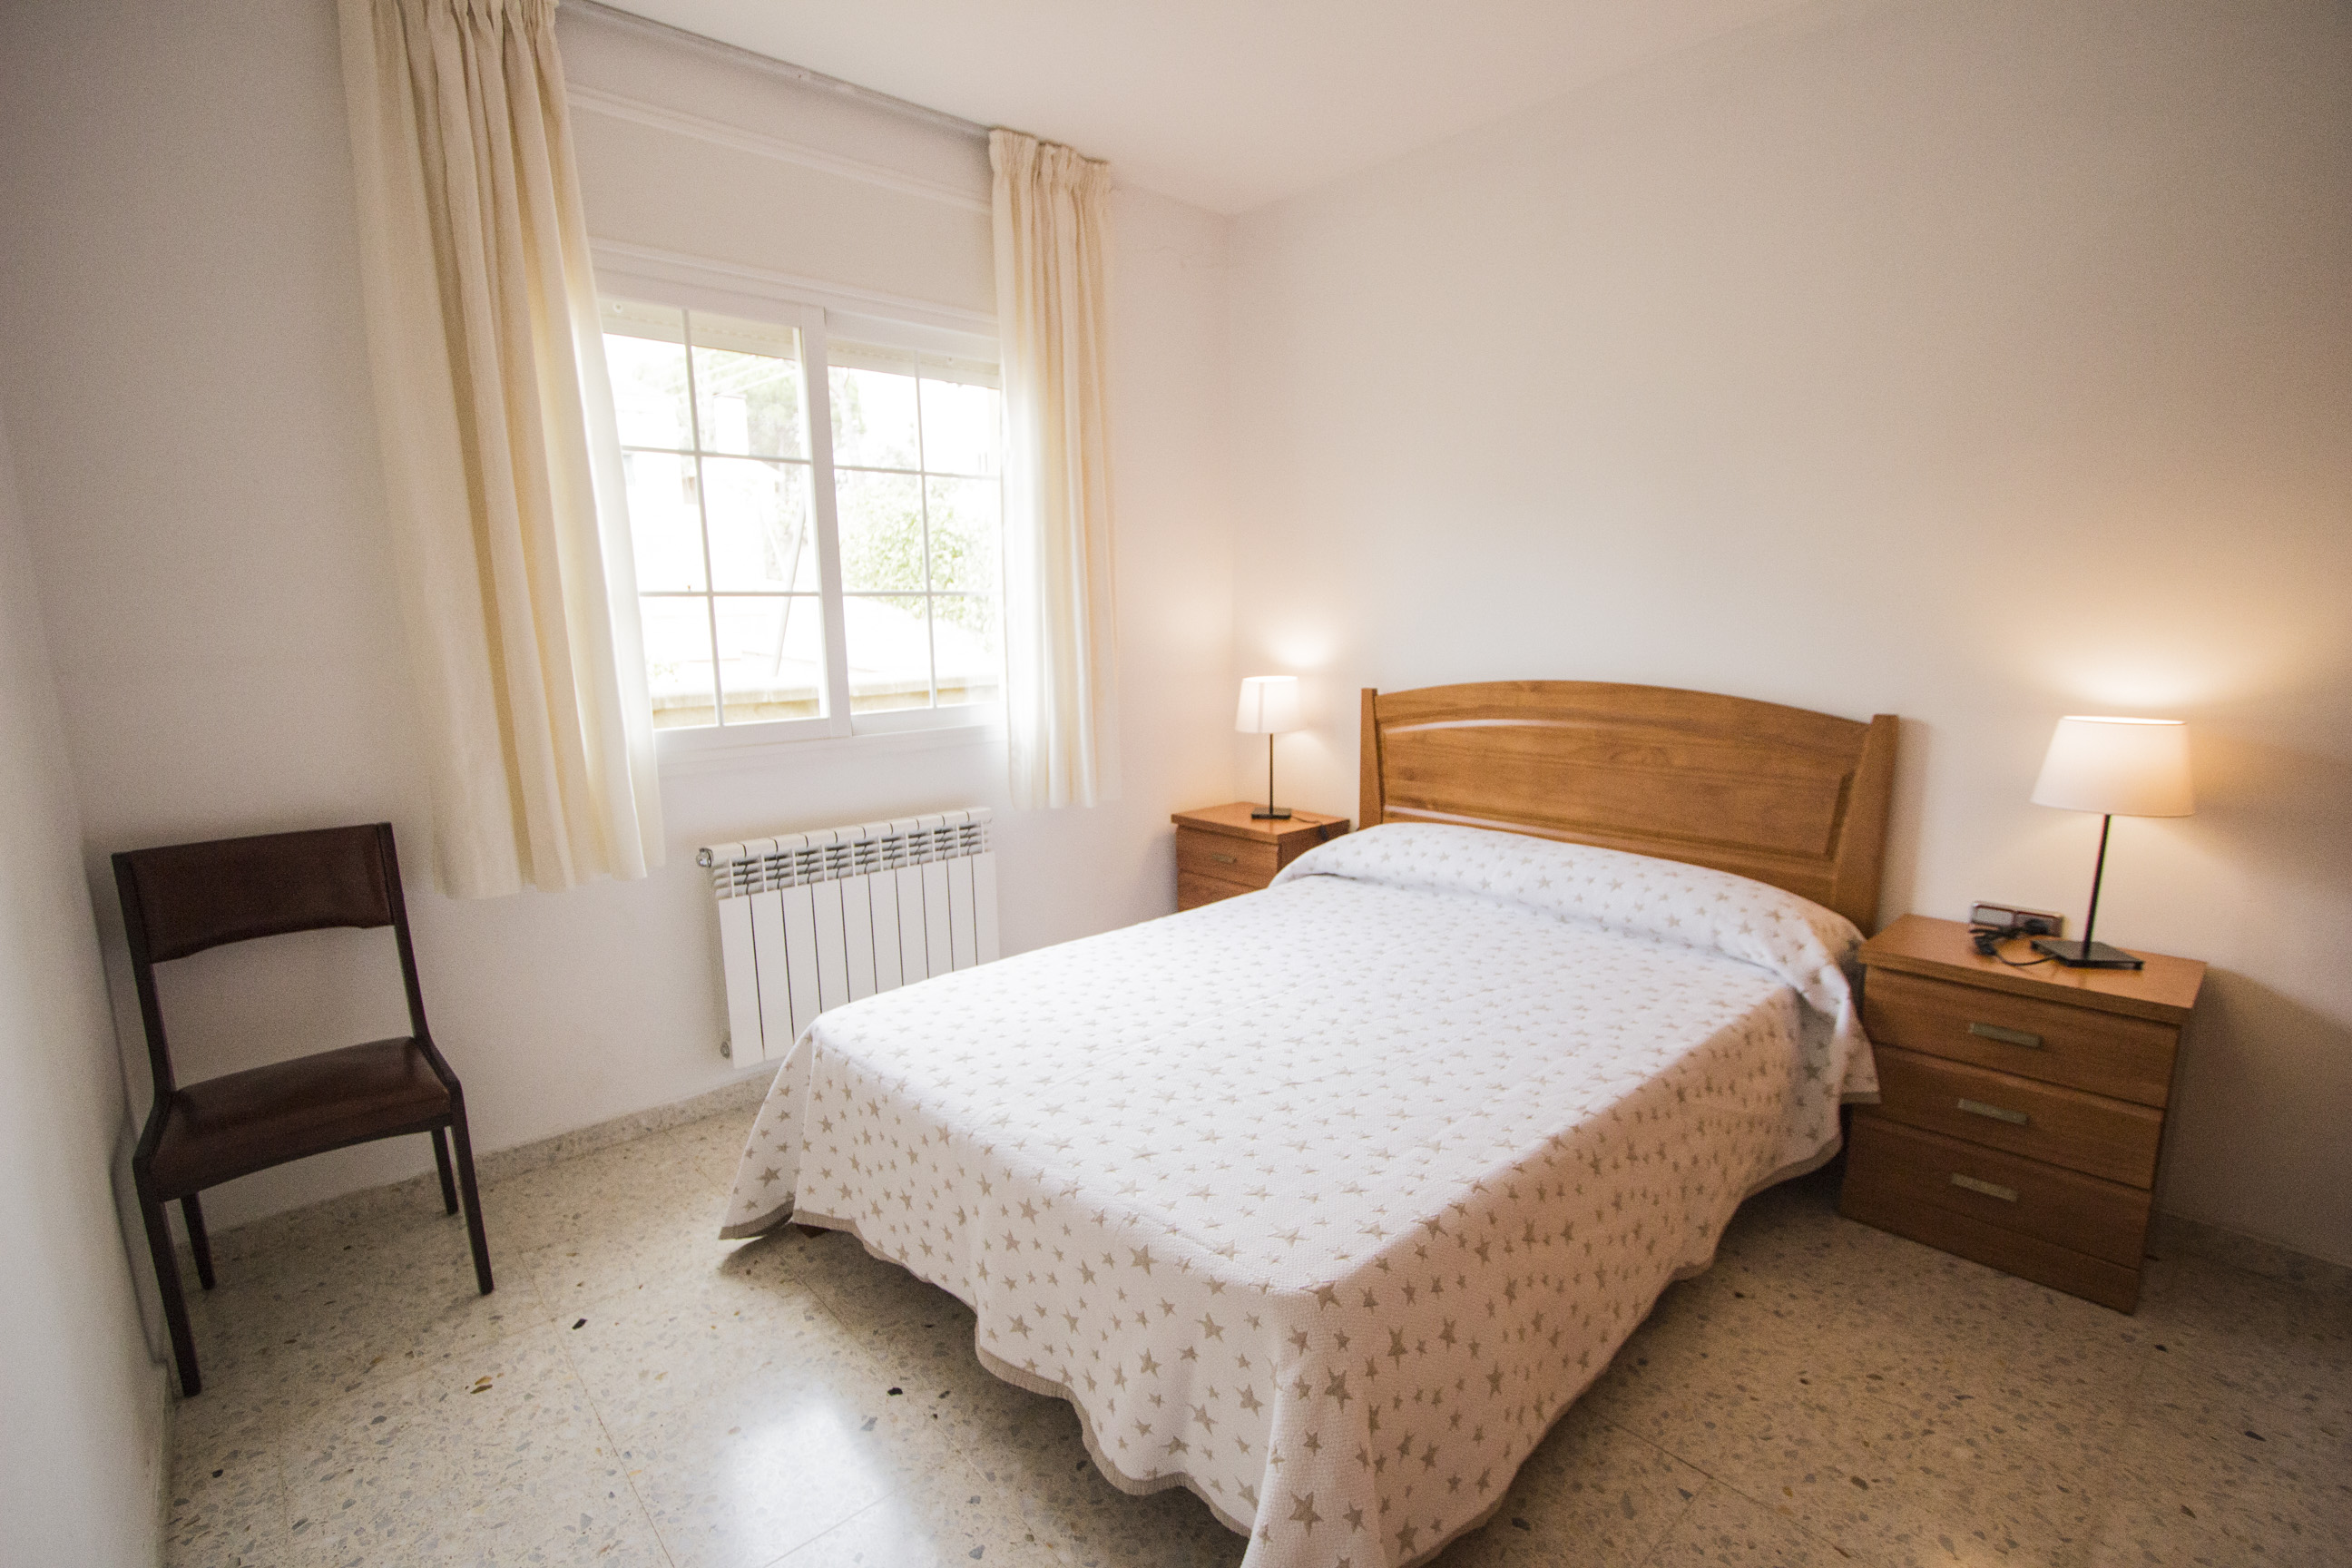 Ferienhaus Catalunya Casas: Peaceful Villa Sils, just 20 km from Costa Brava beaches! (2302155), Les Mallorquines, Girona, Katalonien, Spanien, Bild 17